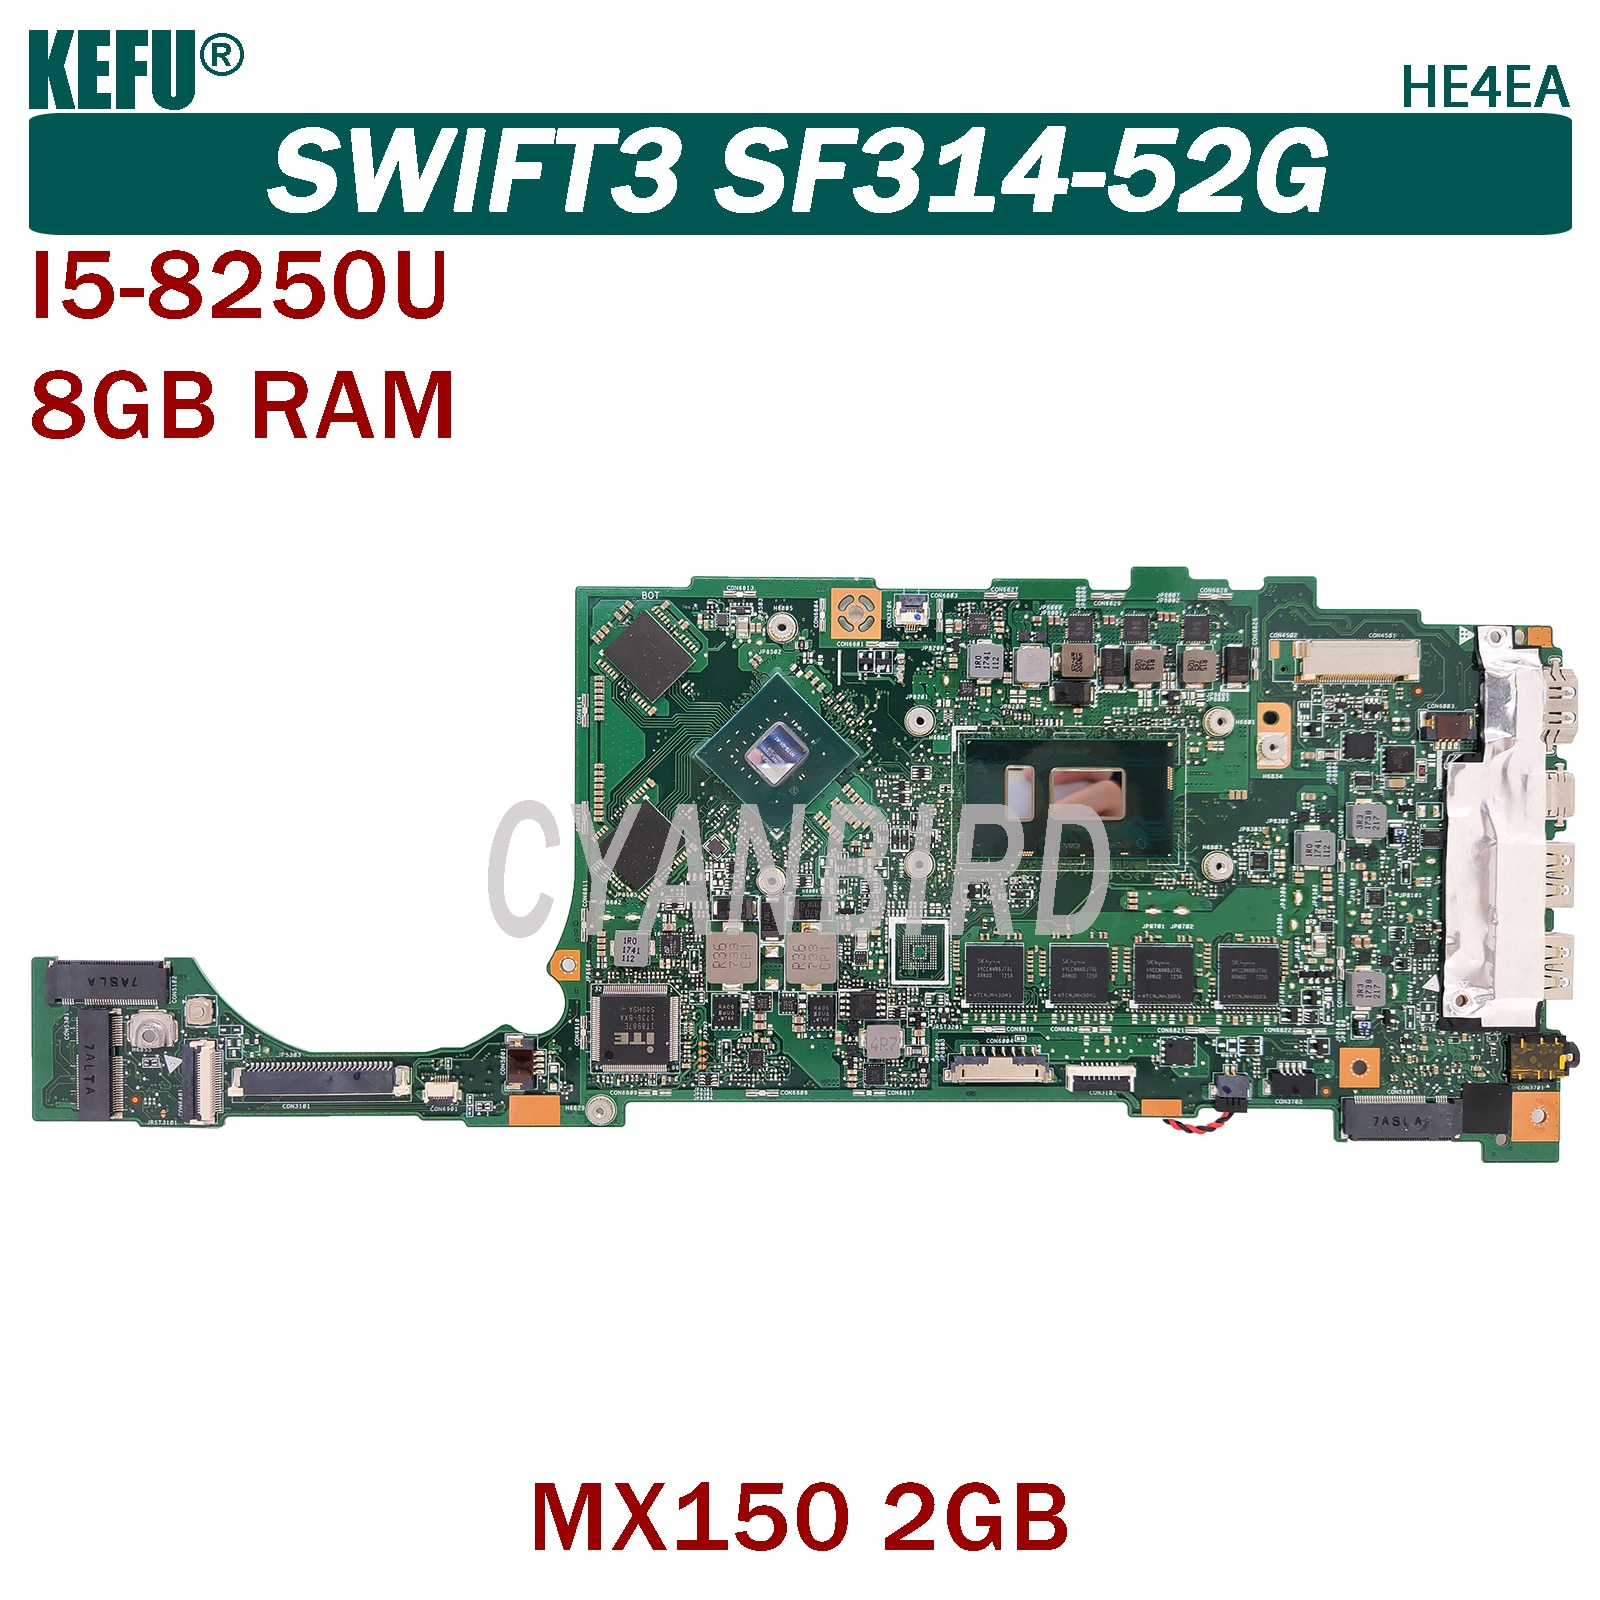 KEFU HE4EA الأصلي اللوحة الرئيسية لشركة أيسر Swift3 SF314-52G SF314-52 مع 8GB-RAM I5-8250U اللوحة الأم للكمبيوتر المحمول MX150-2GB